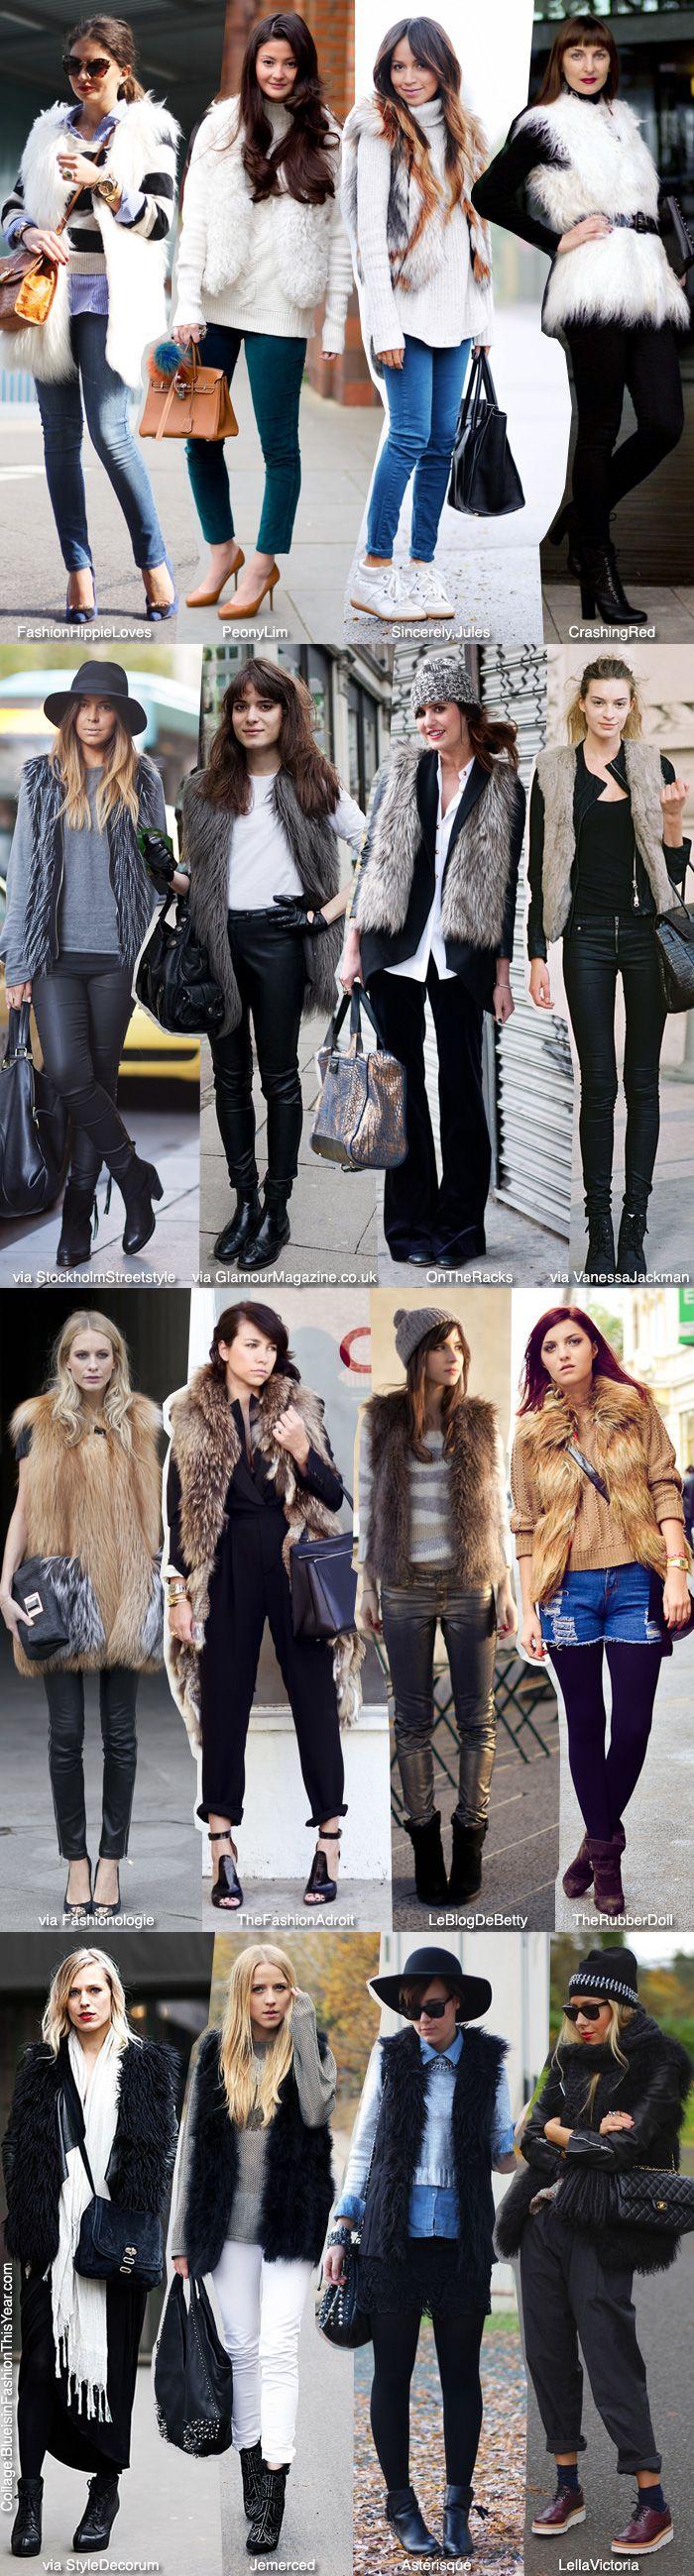 Fur vests. I want a faux one